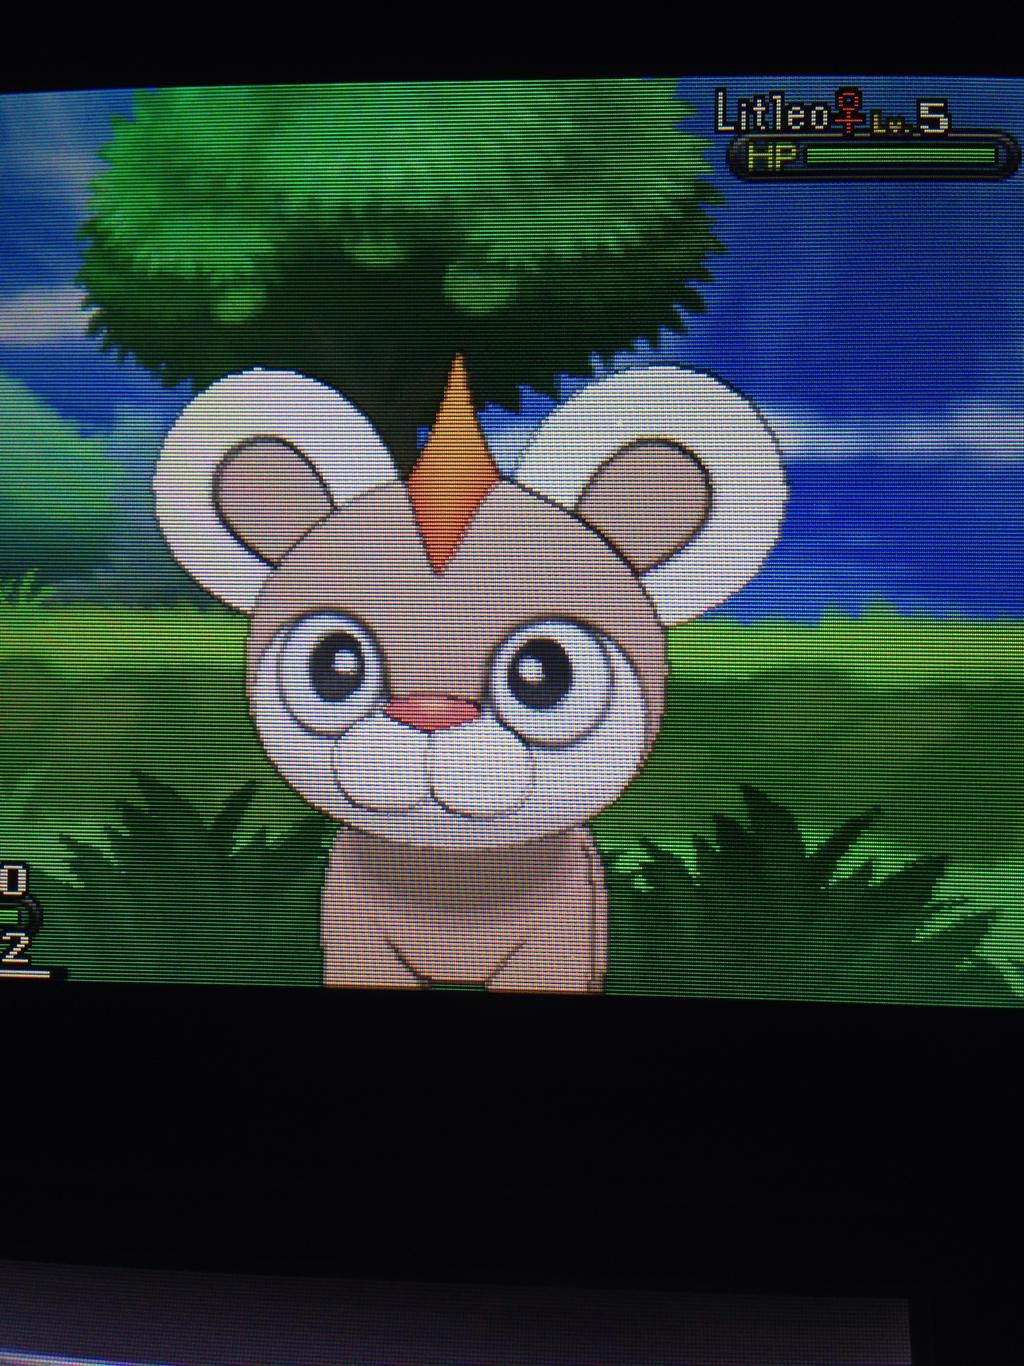 Shiny Litleo :: Pokemon Y by srspibble